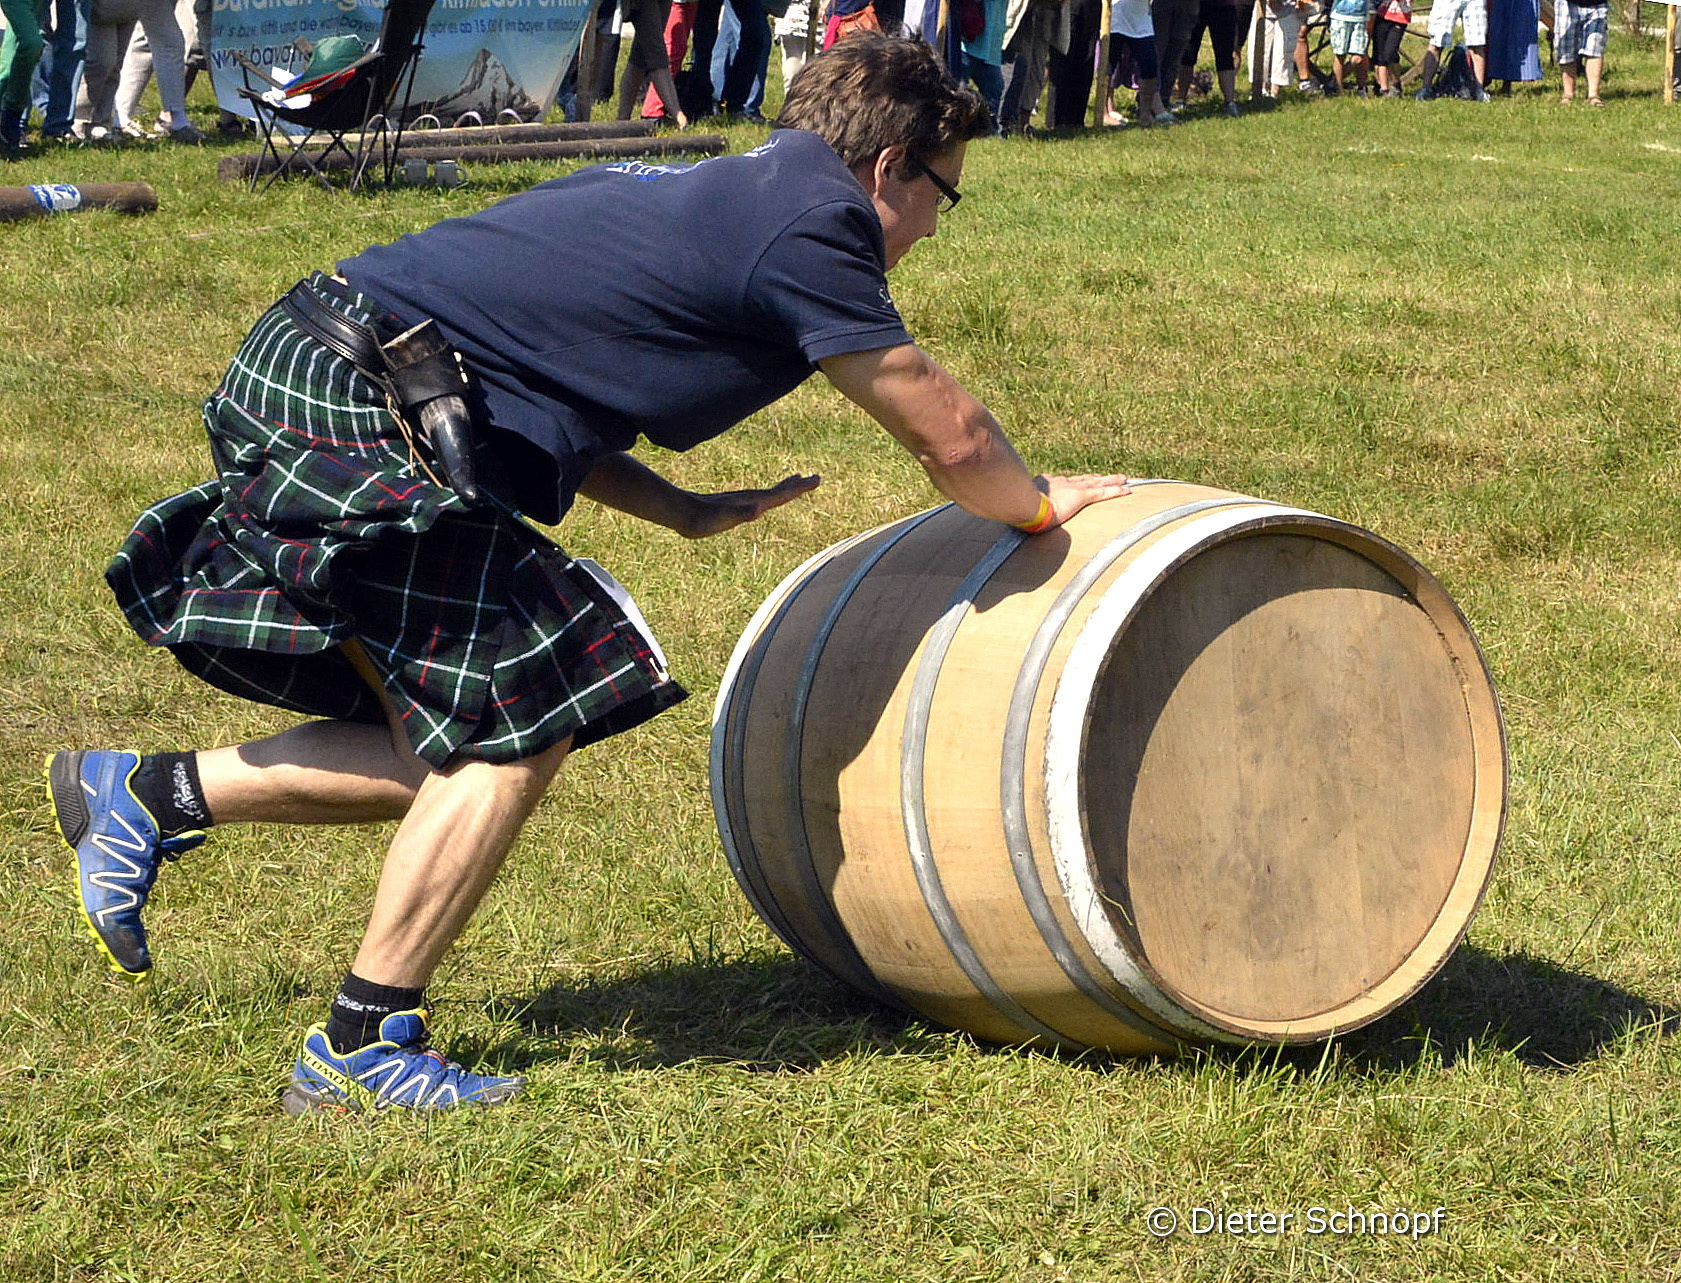 3. Highland Games 2013